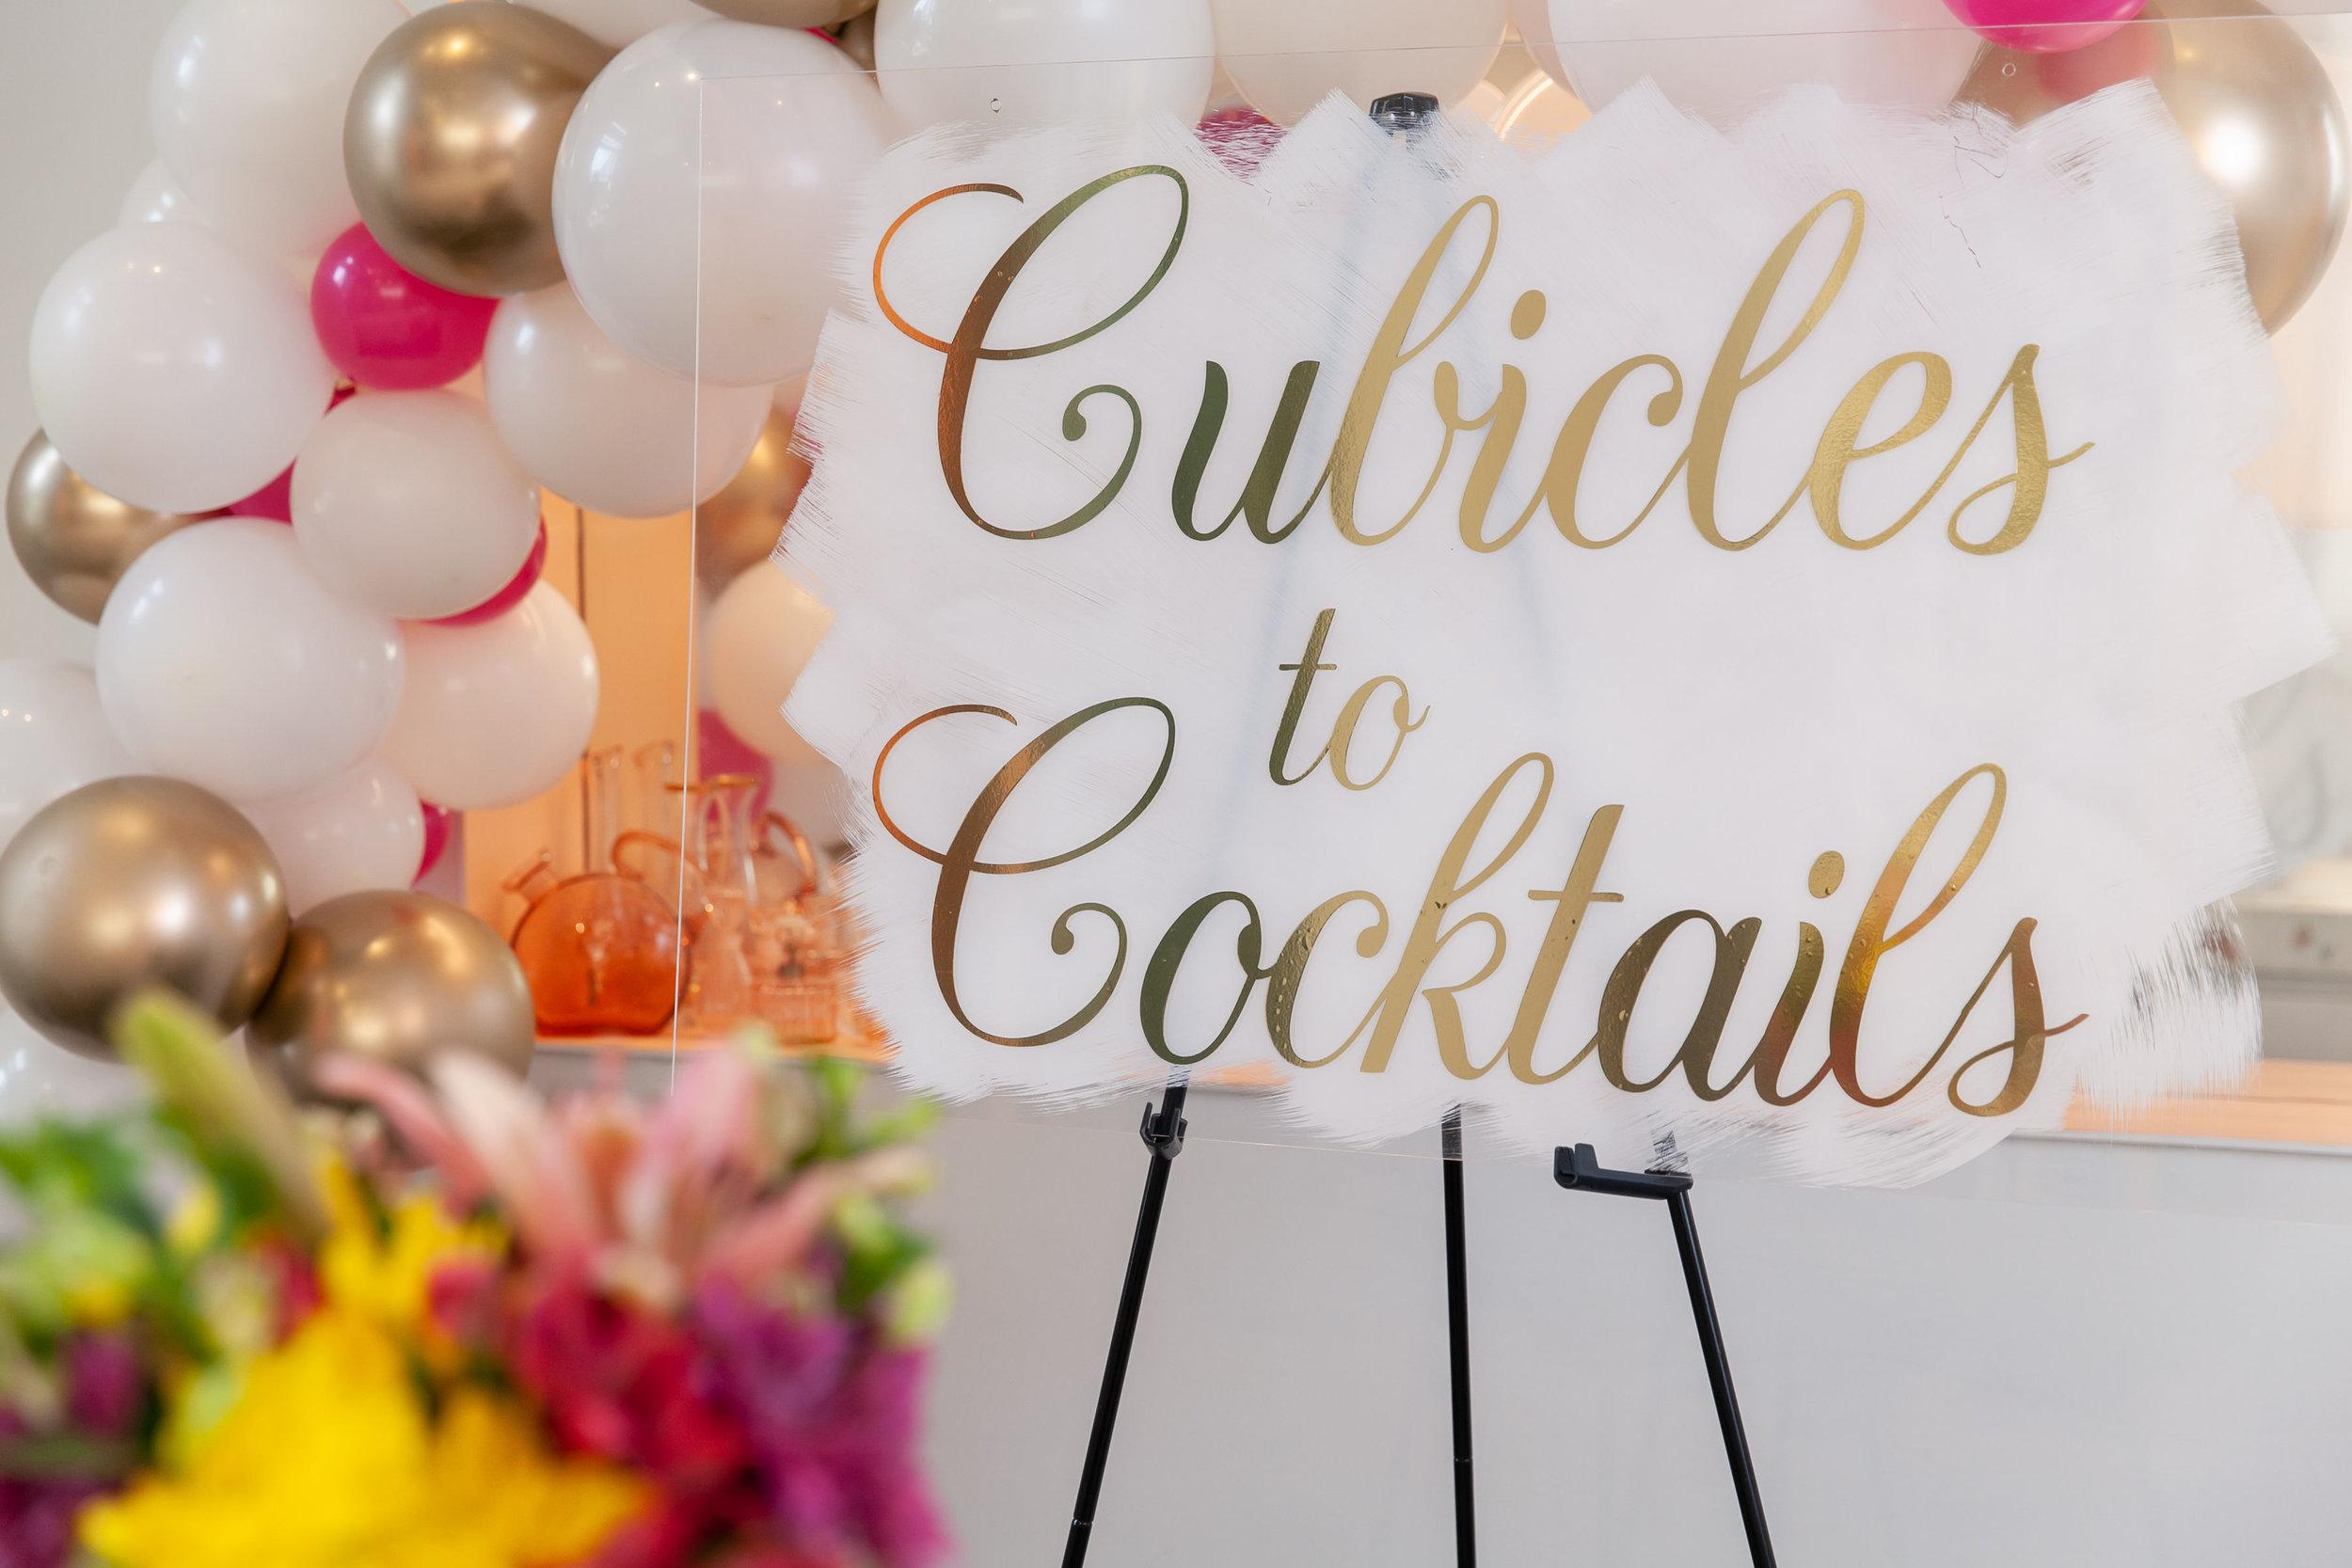 Cubicles_Cocktails2019-25.jpg